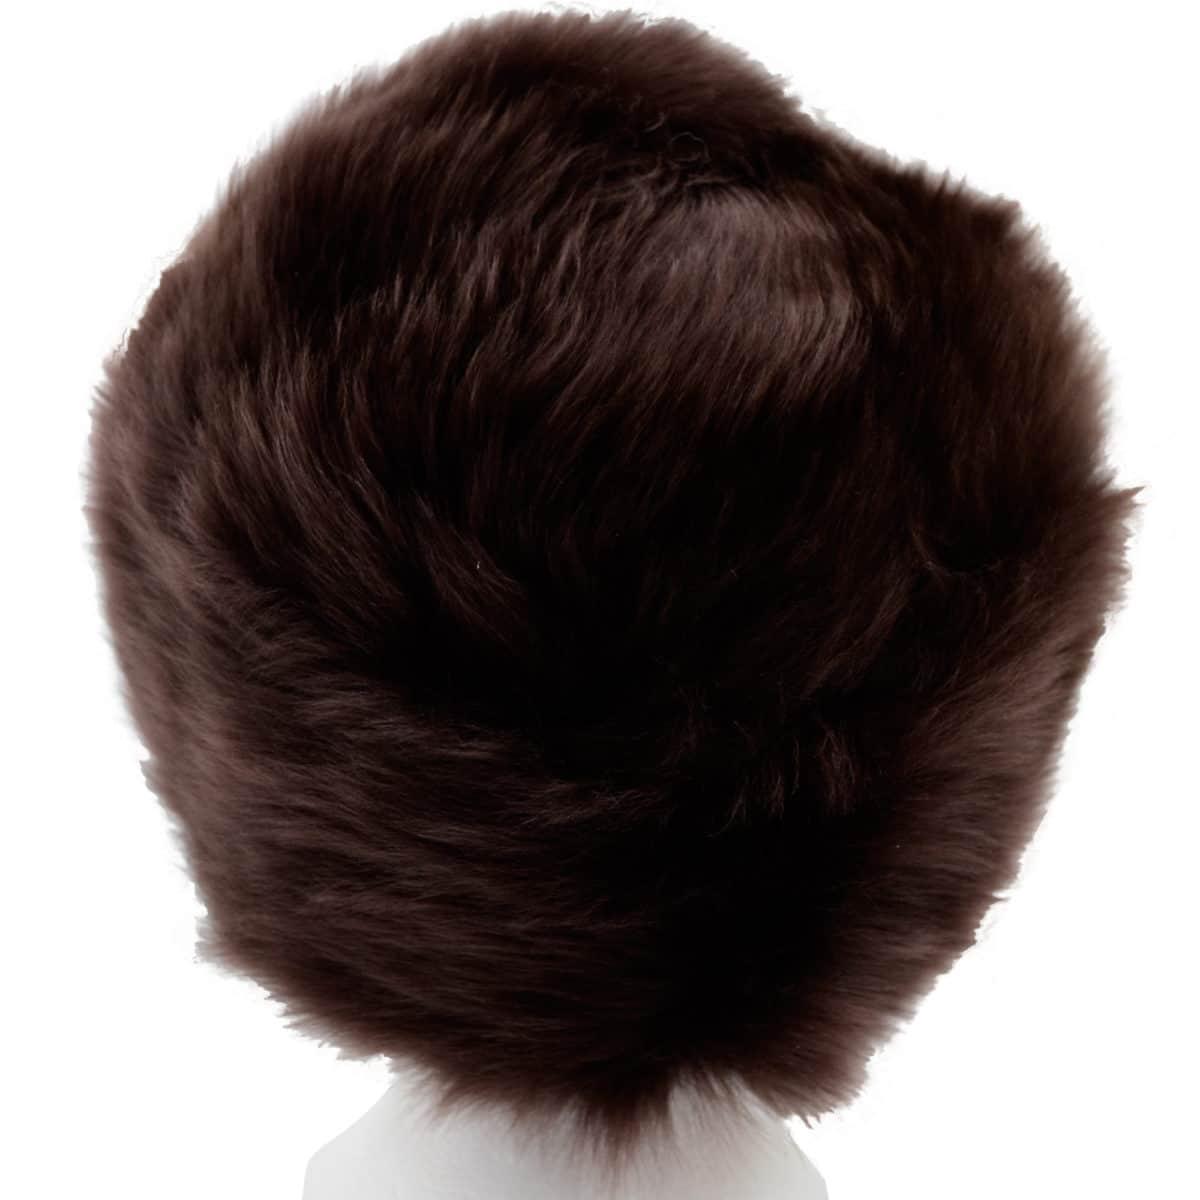 Fern - Ladies Full Sheepskin Hat - Brown (Top)